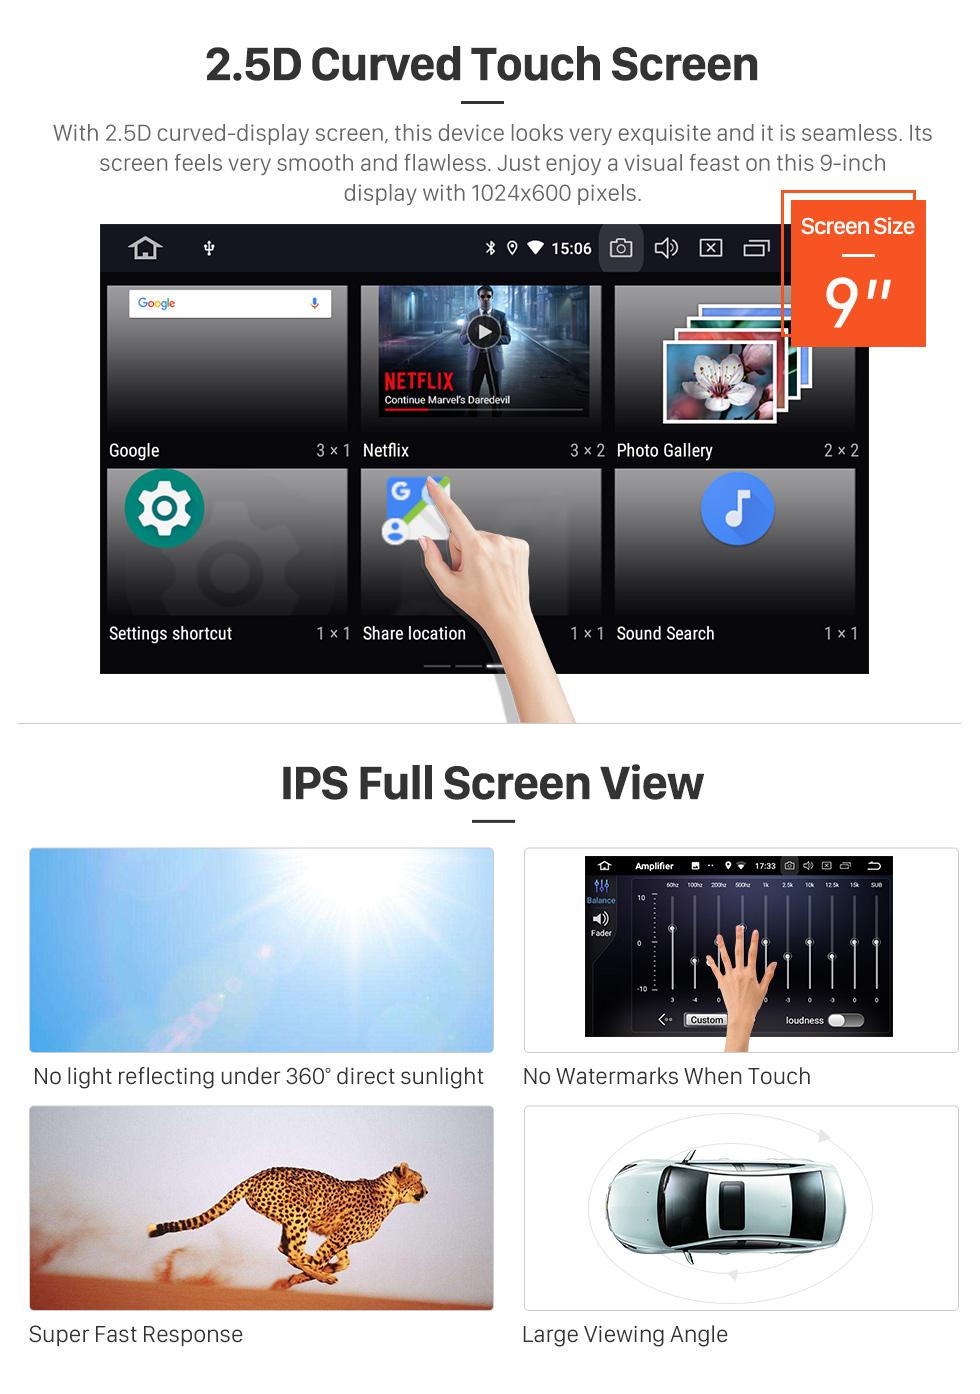 Seicane OEM 9-дюймовый Android 9.0 GPS навигационное радио для 2016-2017 Baic E Series E130 E150 / EV Series EV160 EV200 / Senova D20 Bluetooth HD с сенсорным экраном Поддержка Carplay TPMS